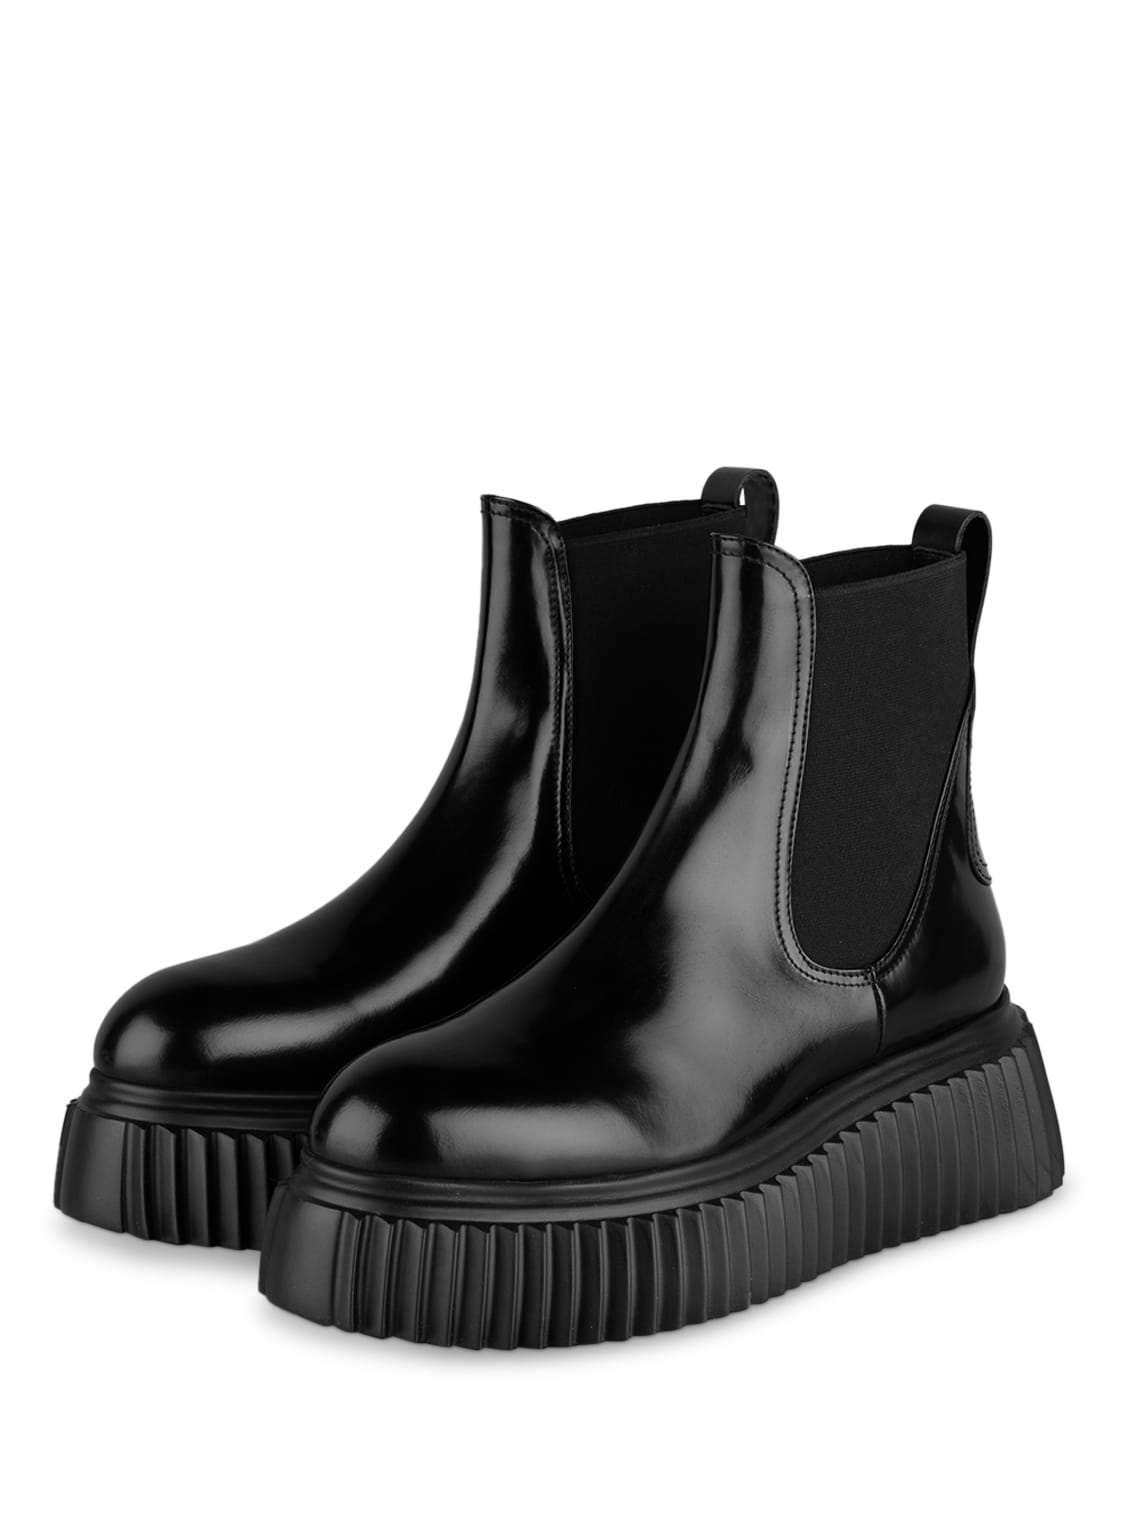 Image of Agl Chelsea-Boots Malisa schwarz